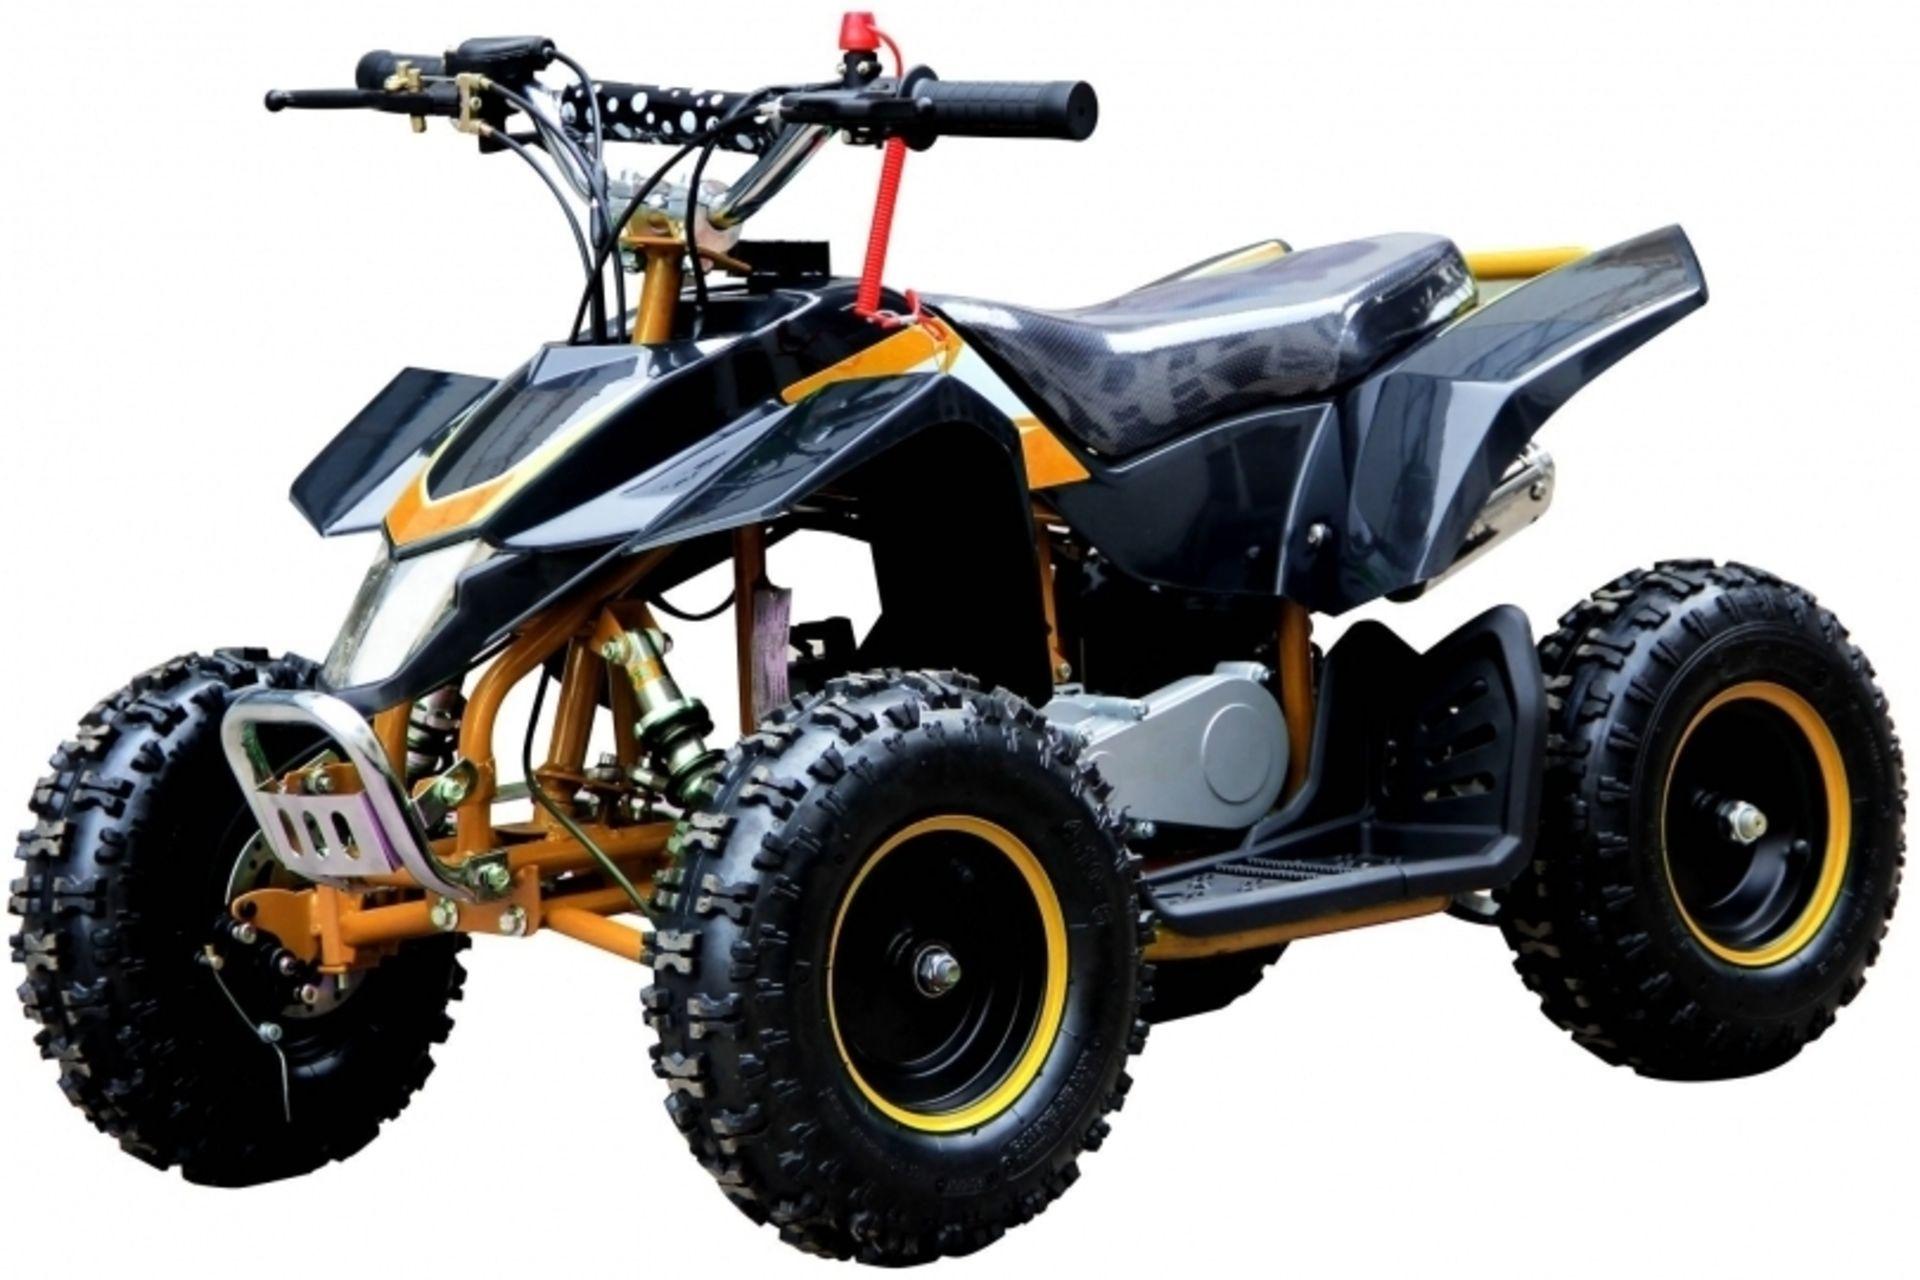 Lot 43018 - V Brand New 50cc Zikai Mini Quad - Colours May Vary